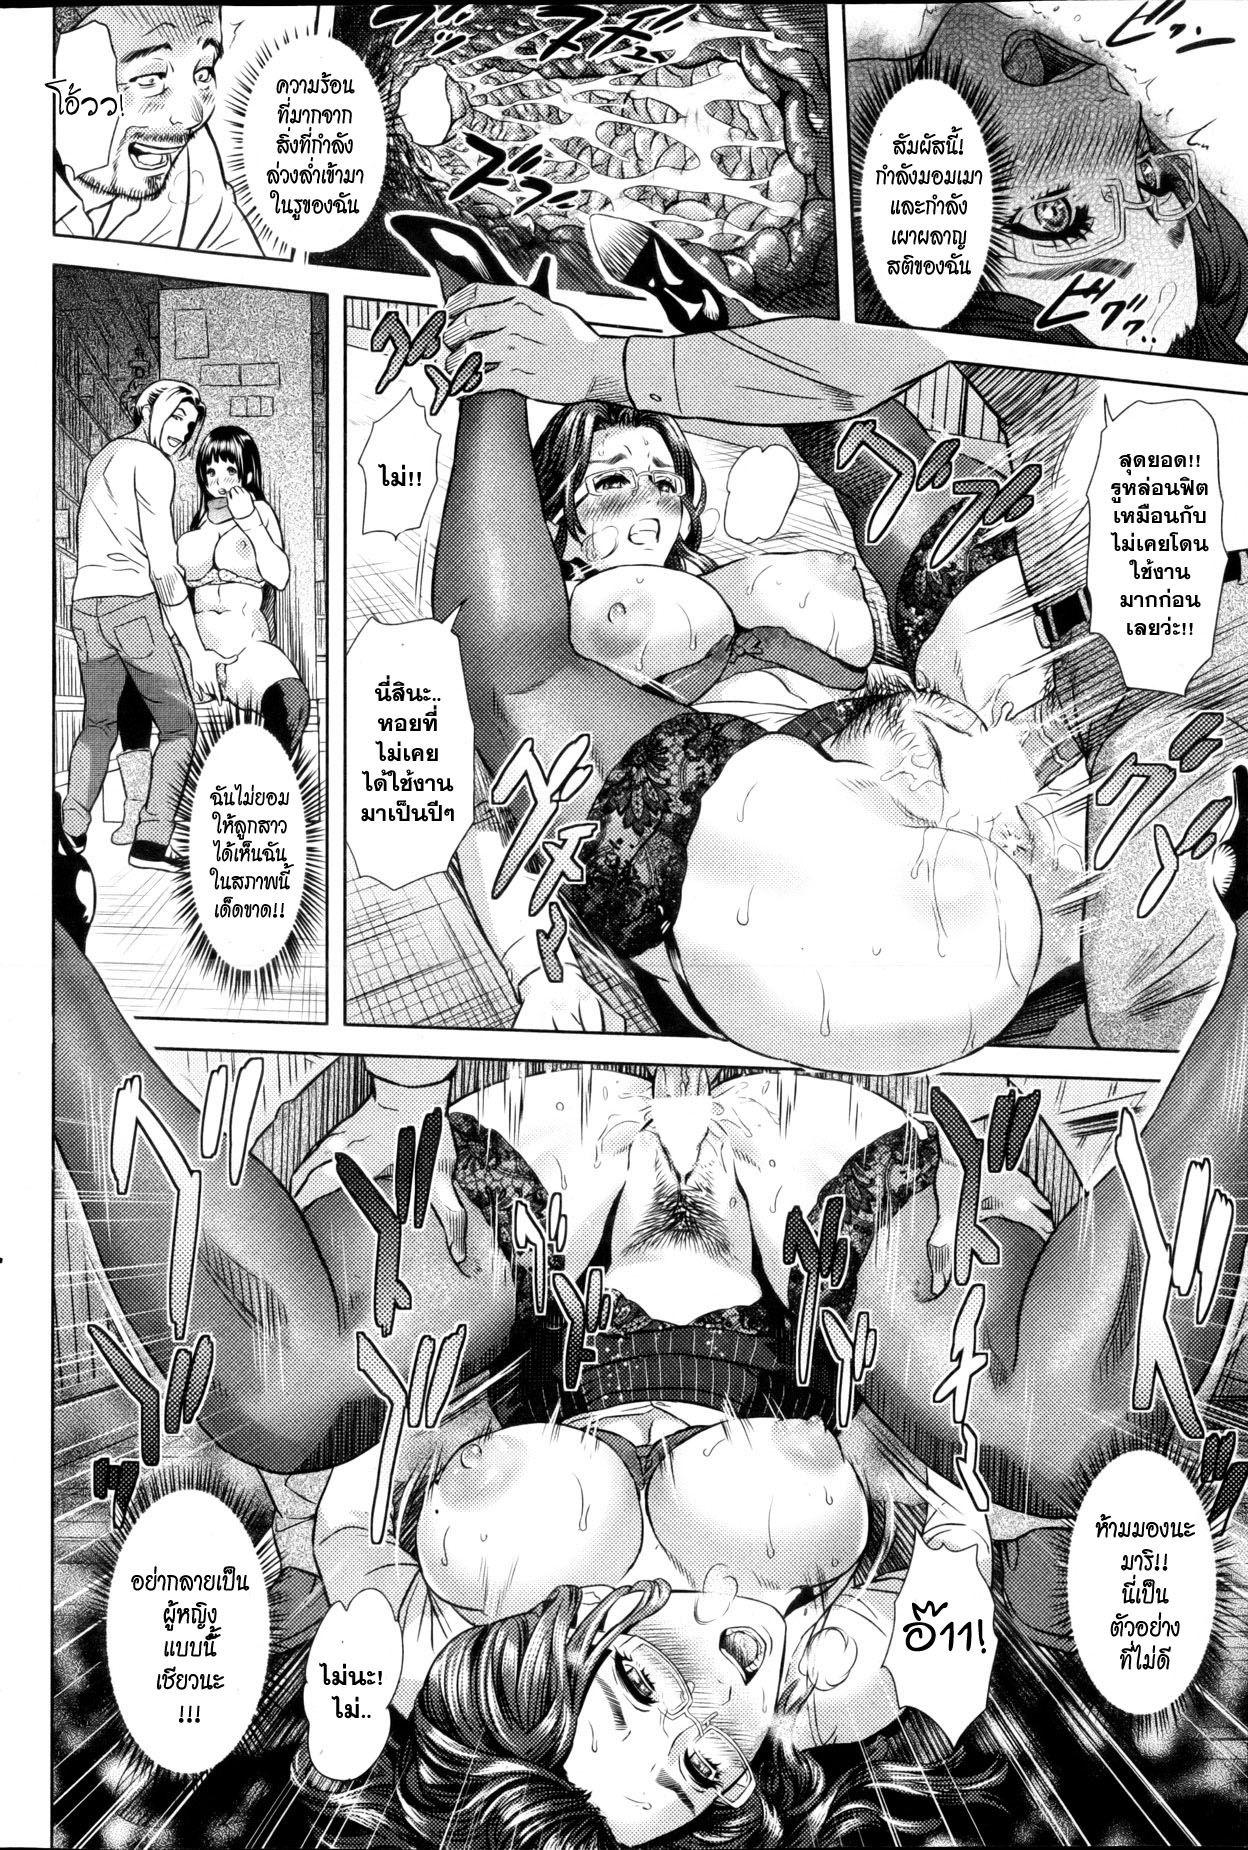 =C@T@12OCK= | การ์ตูน Doujin Manga แปลไทยล้วนๆ  XONLY4